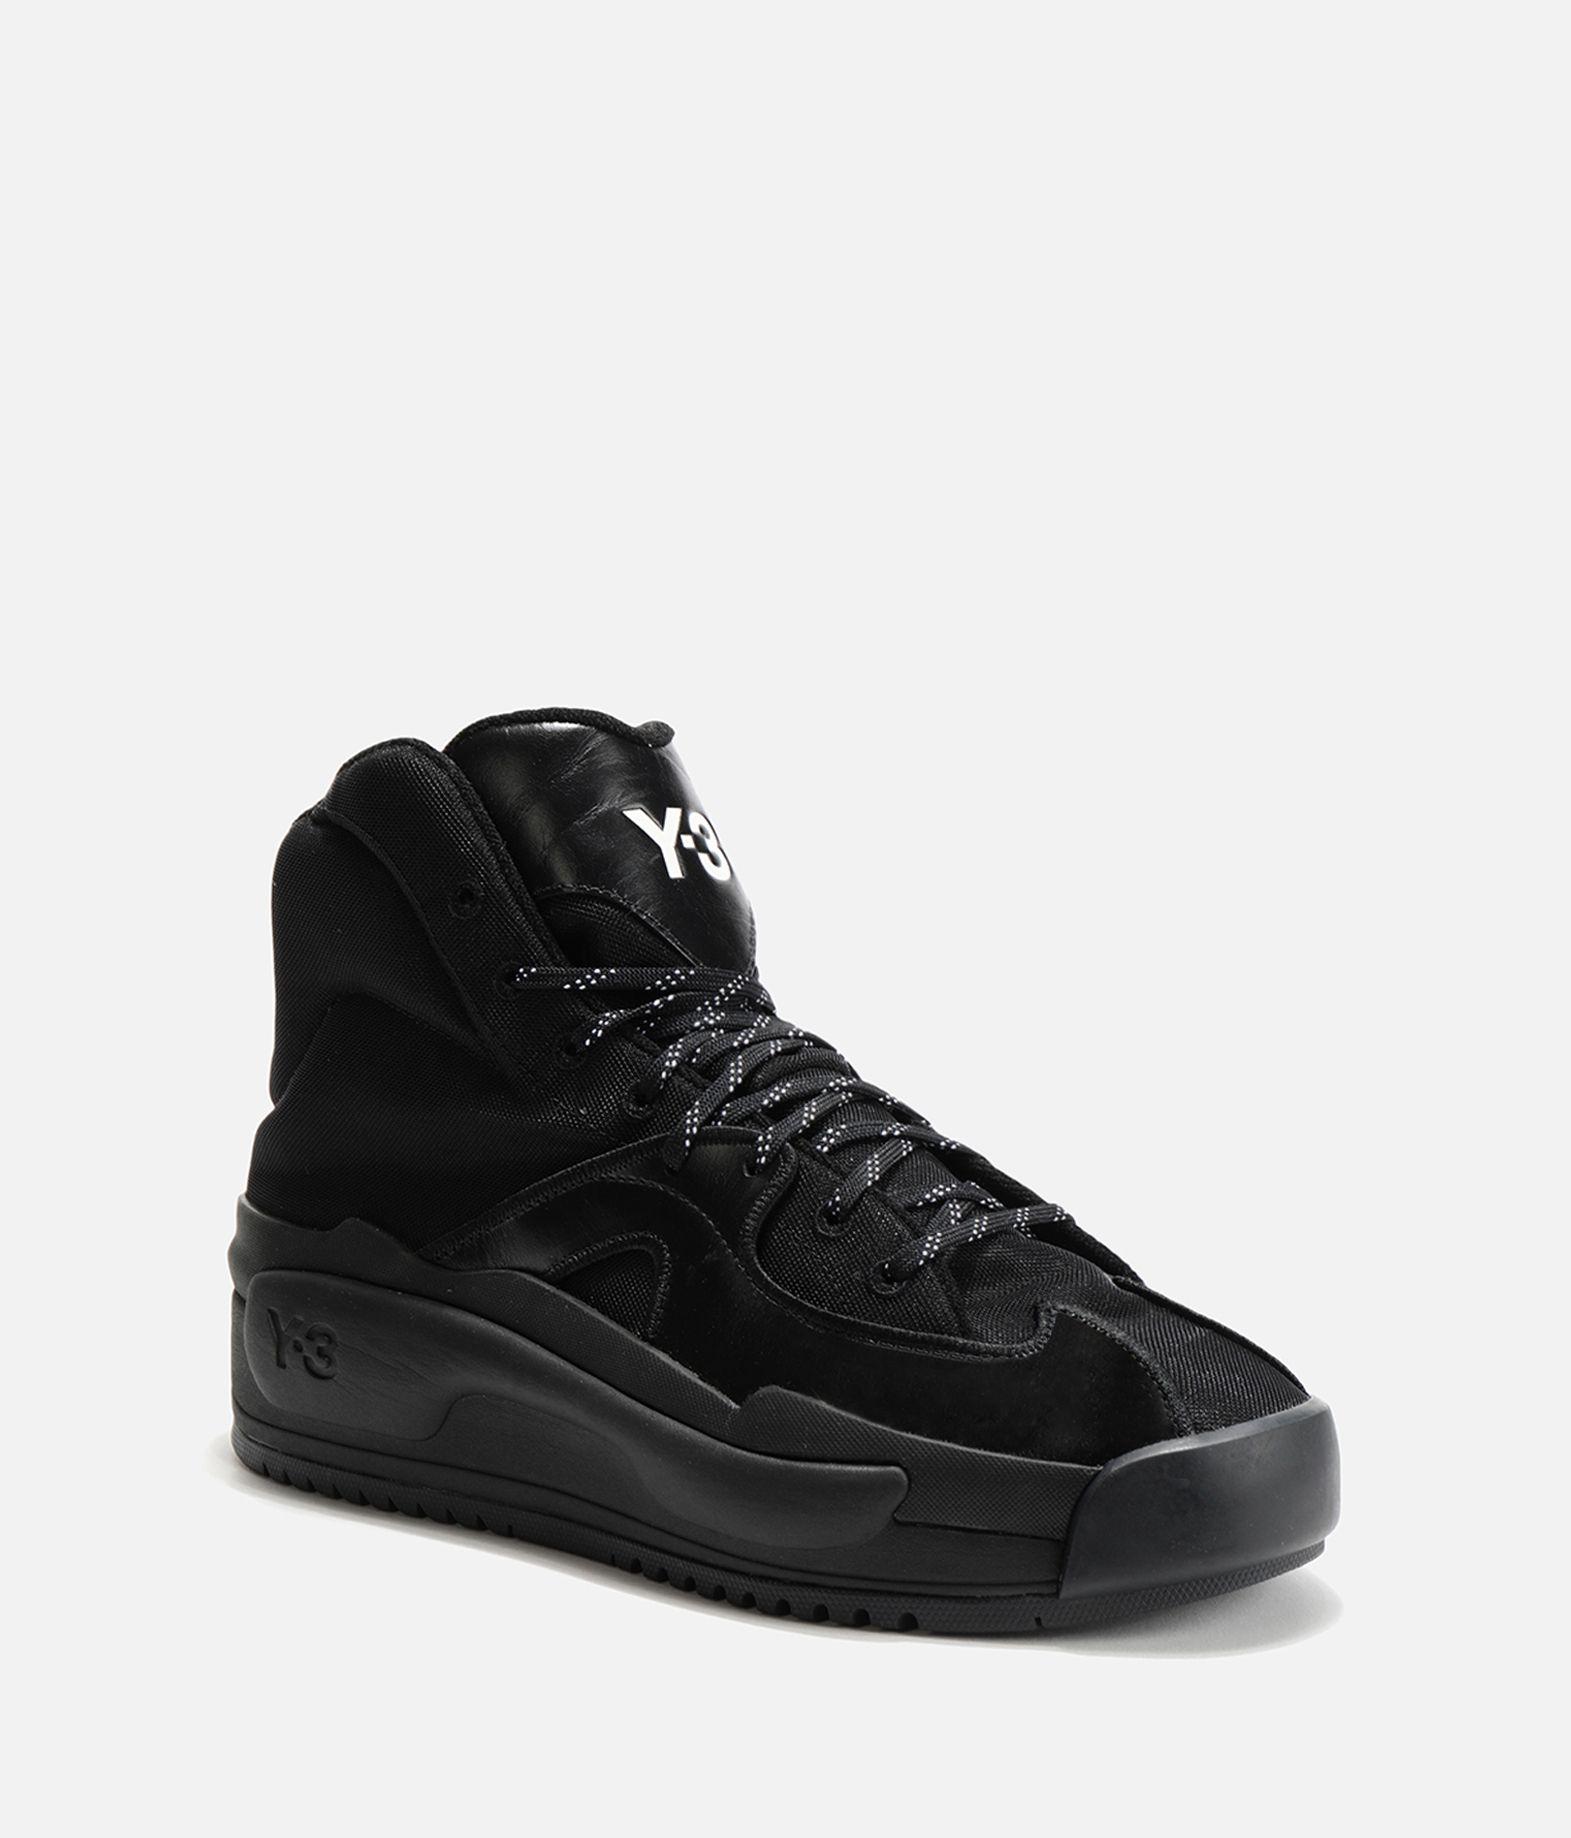 Y-3 Y-3 Hokori Sneakers Dame e